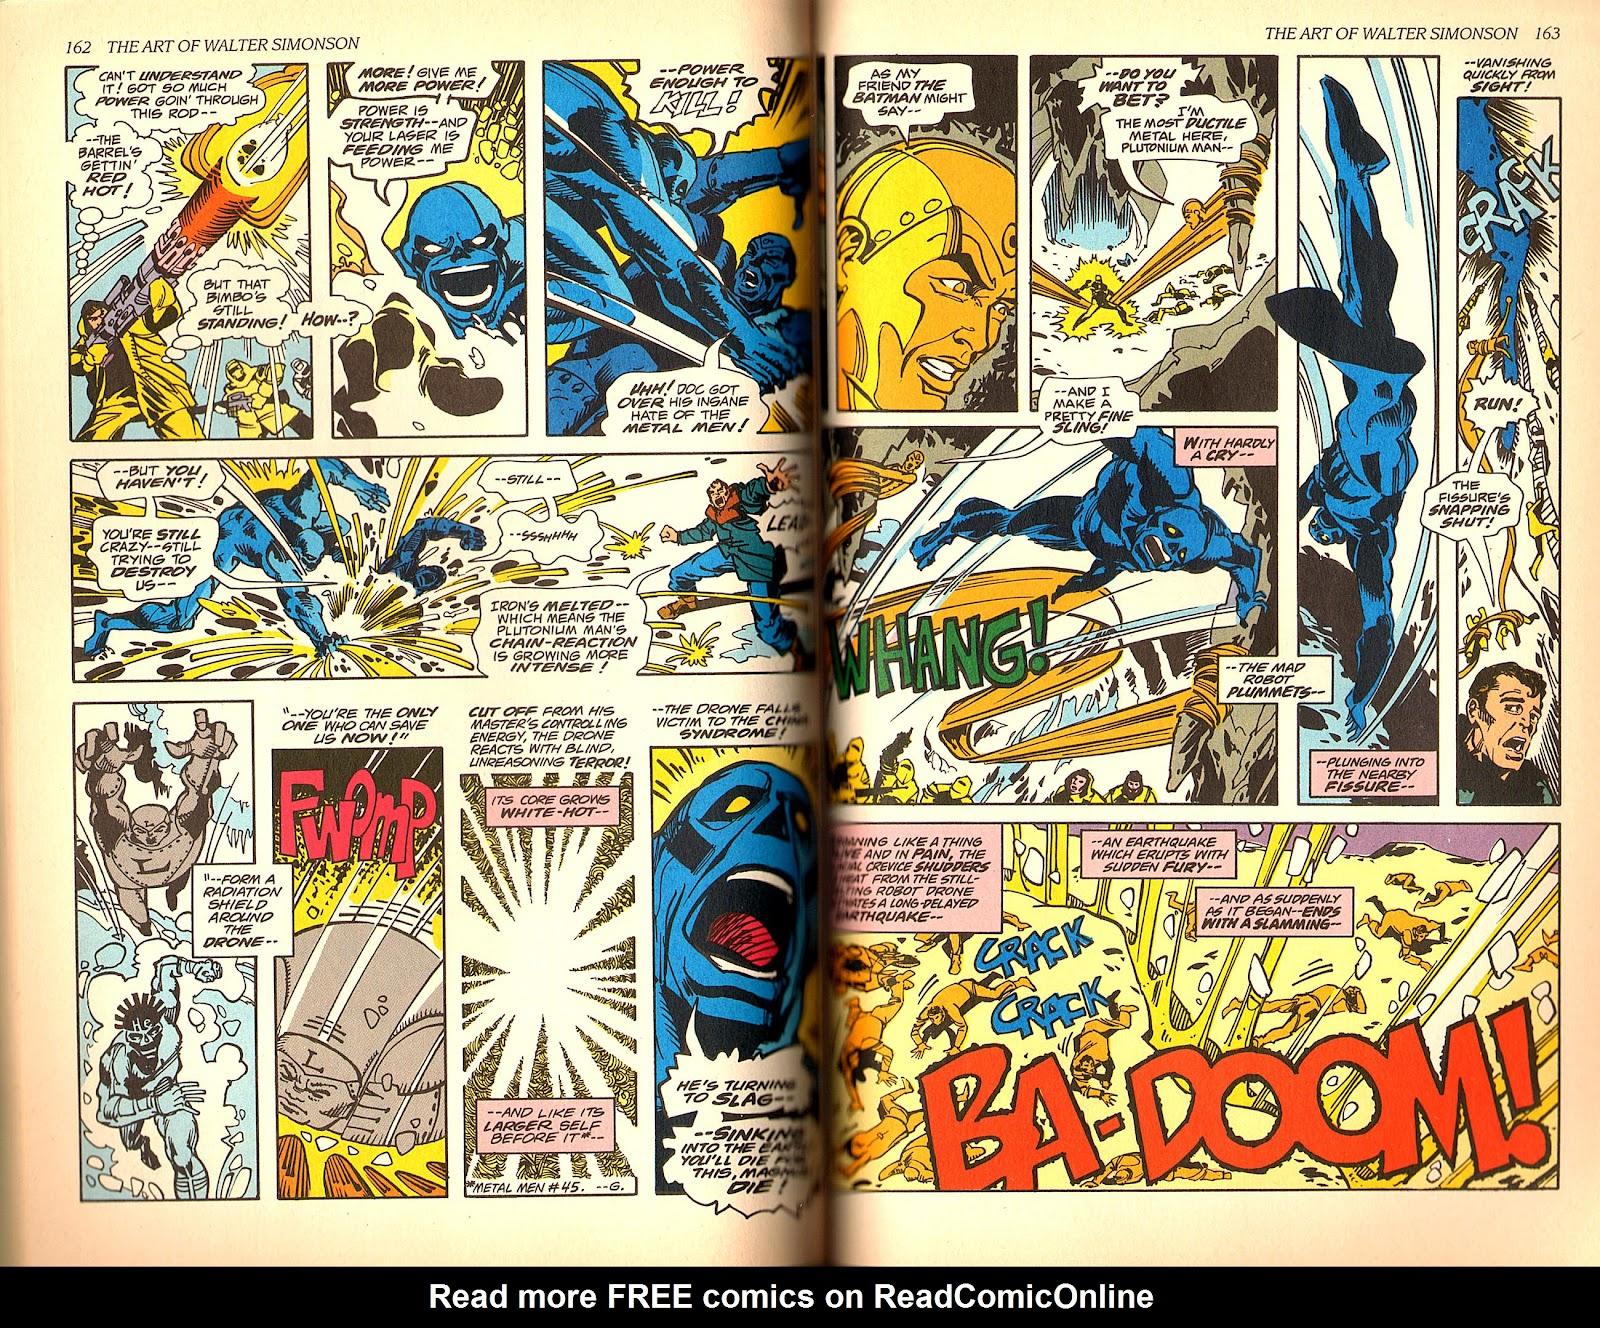 Read online The Art of Walter Simonson comic -  Issue # TPB - 83